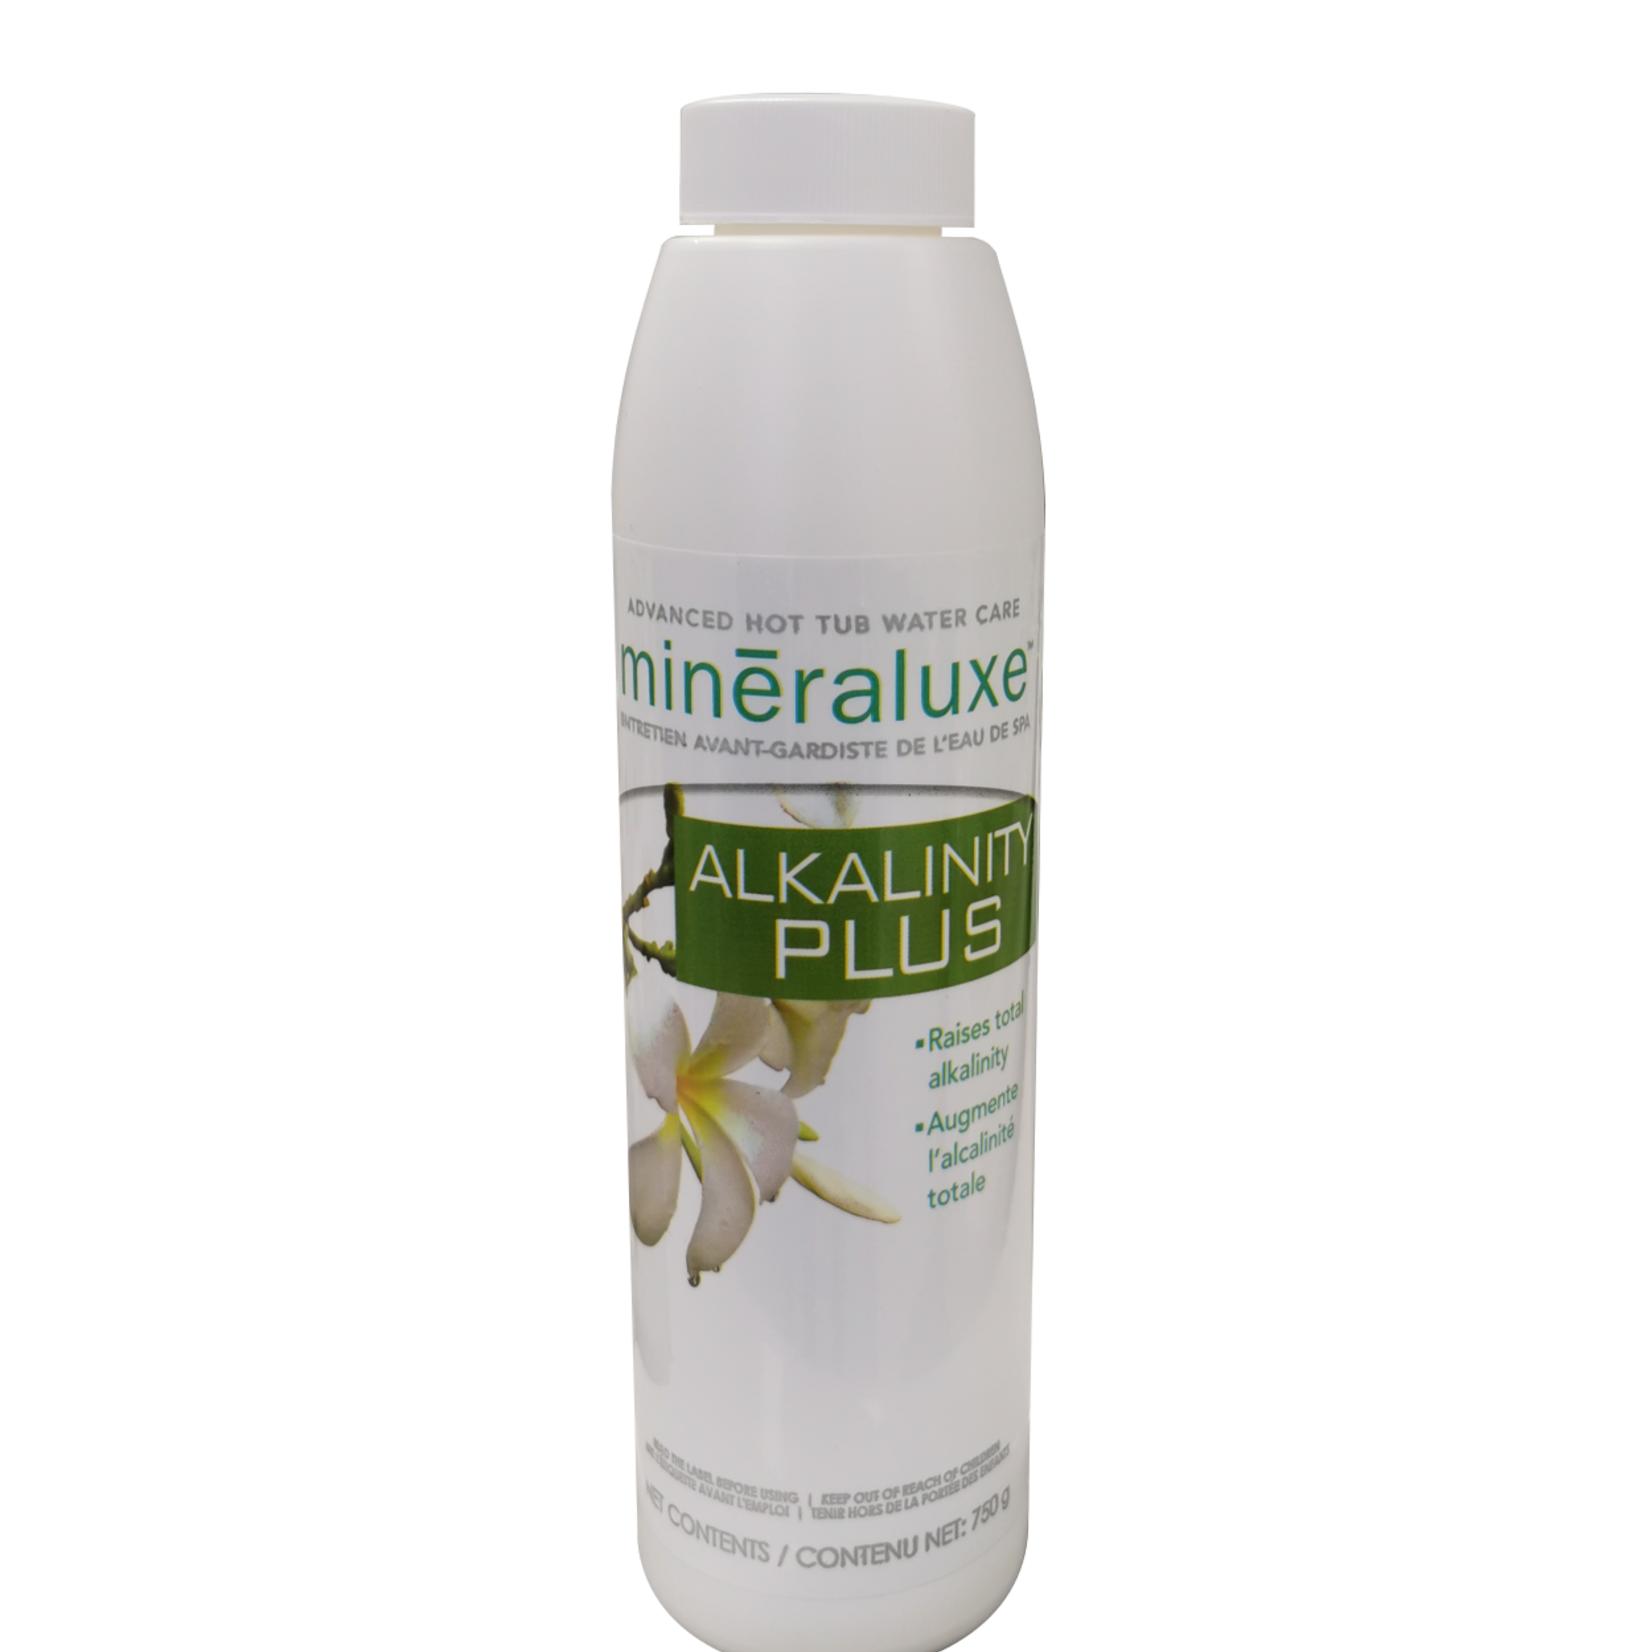 Mineraluxe Alkalinity Plus (750 g)